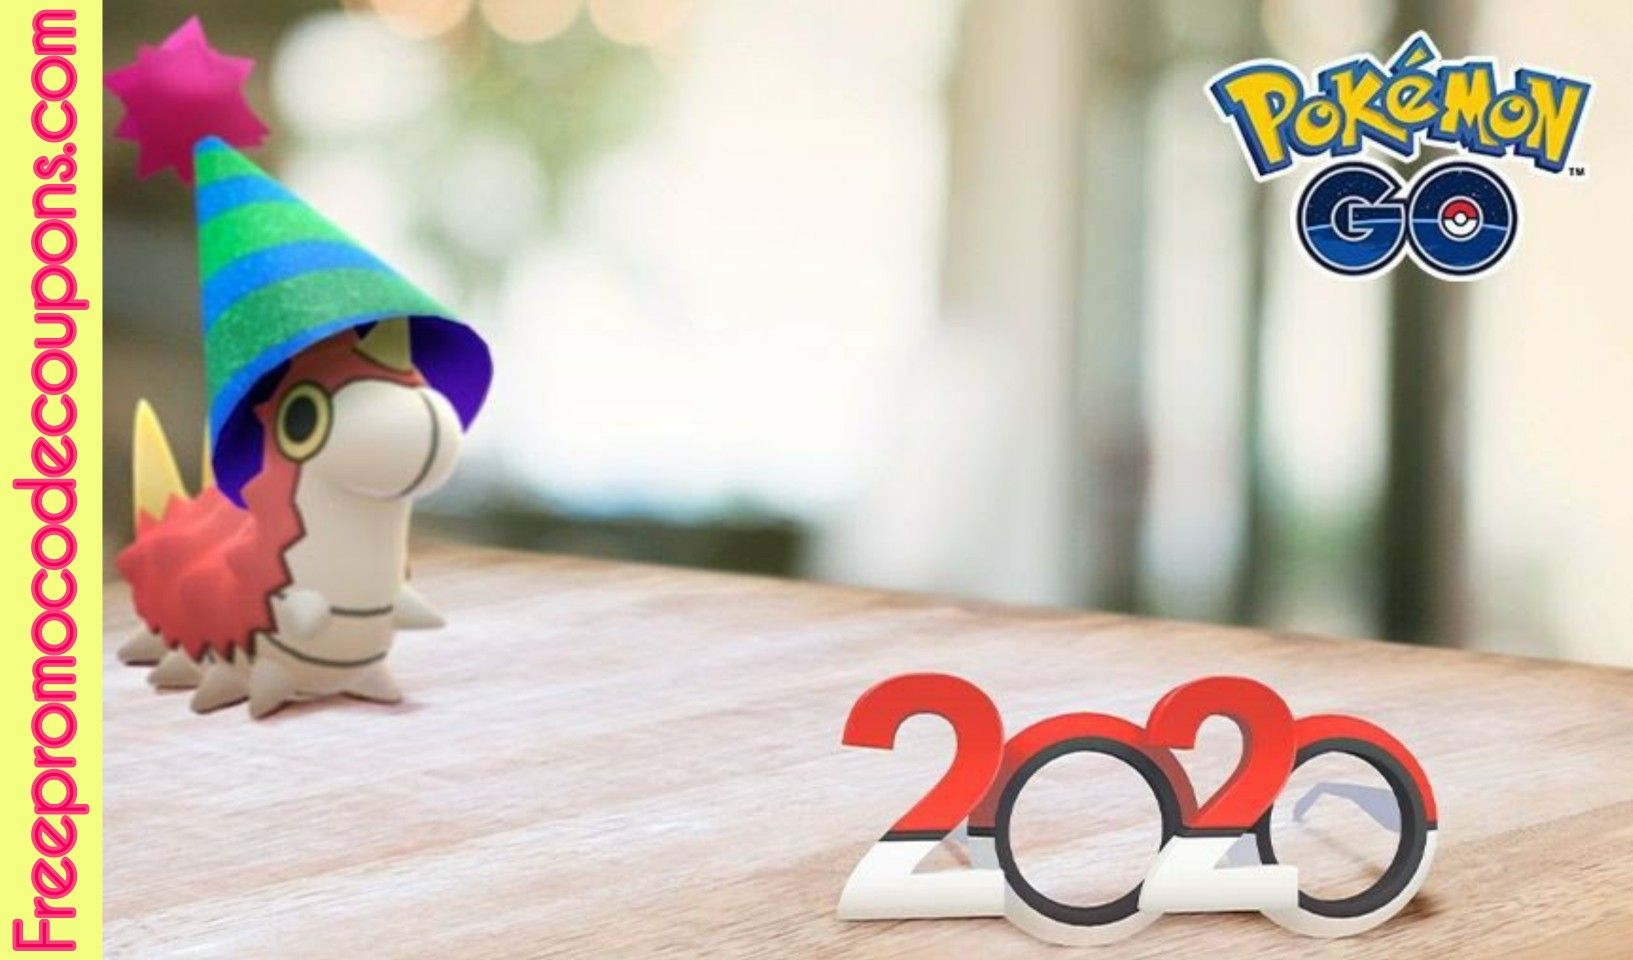 Grab the New Mega List of Pokemon go Promo Codes in 2020